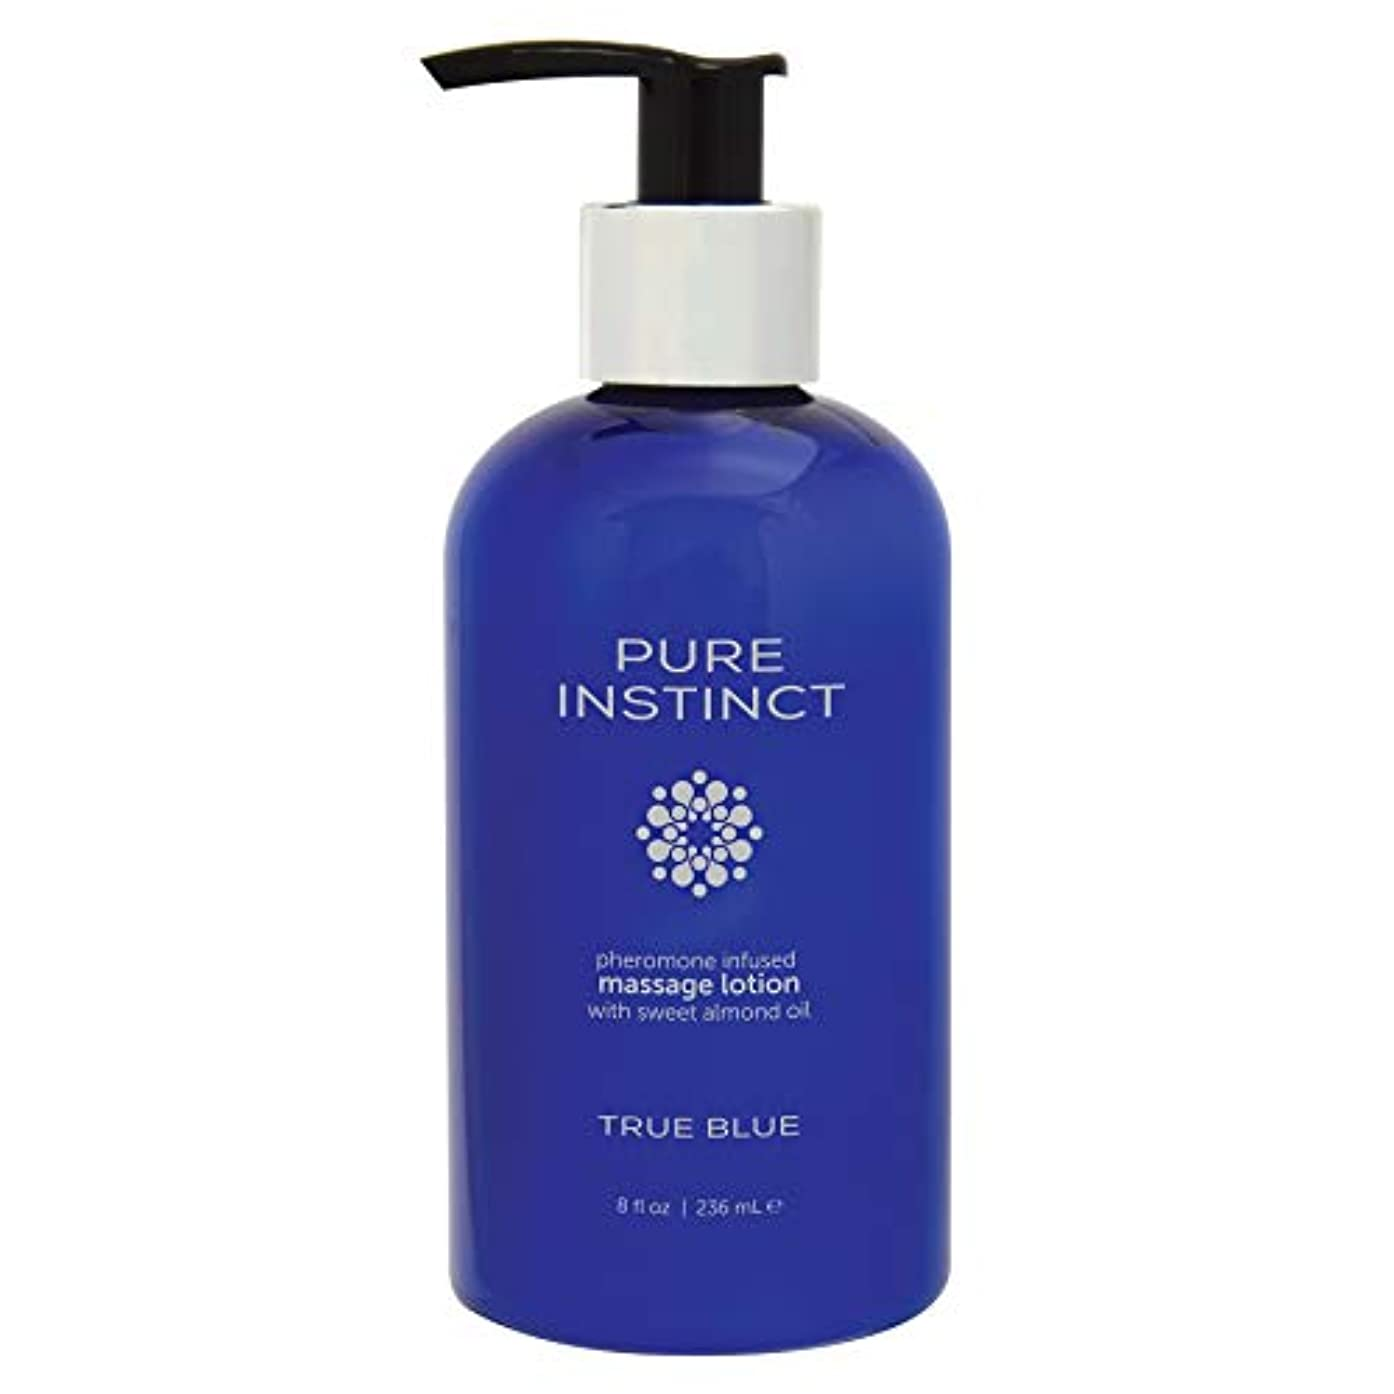 Pure Instinct Pheromone Unisex Body Lotion 8oz by Classic Erotica